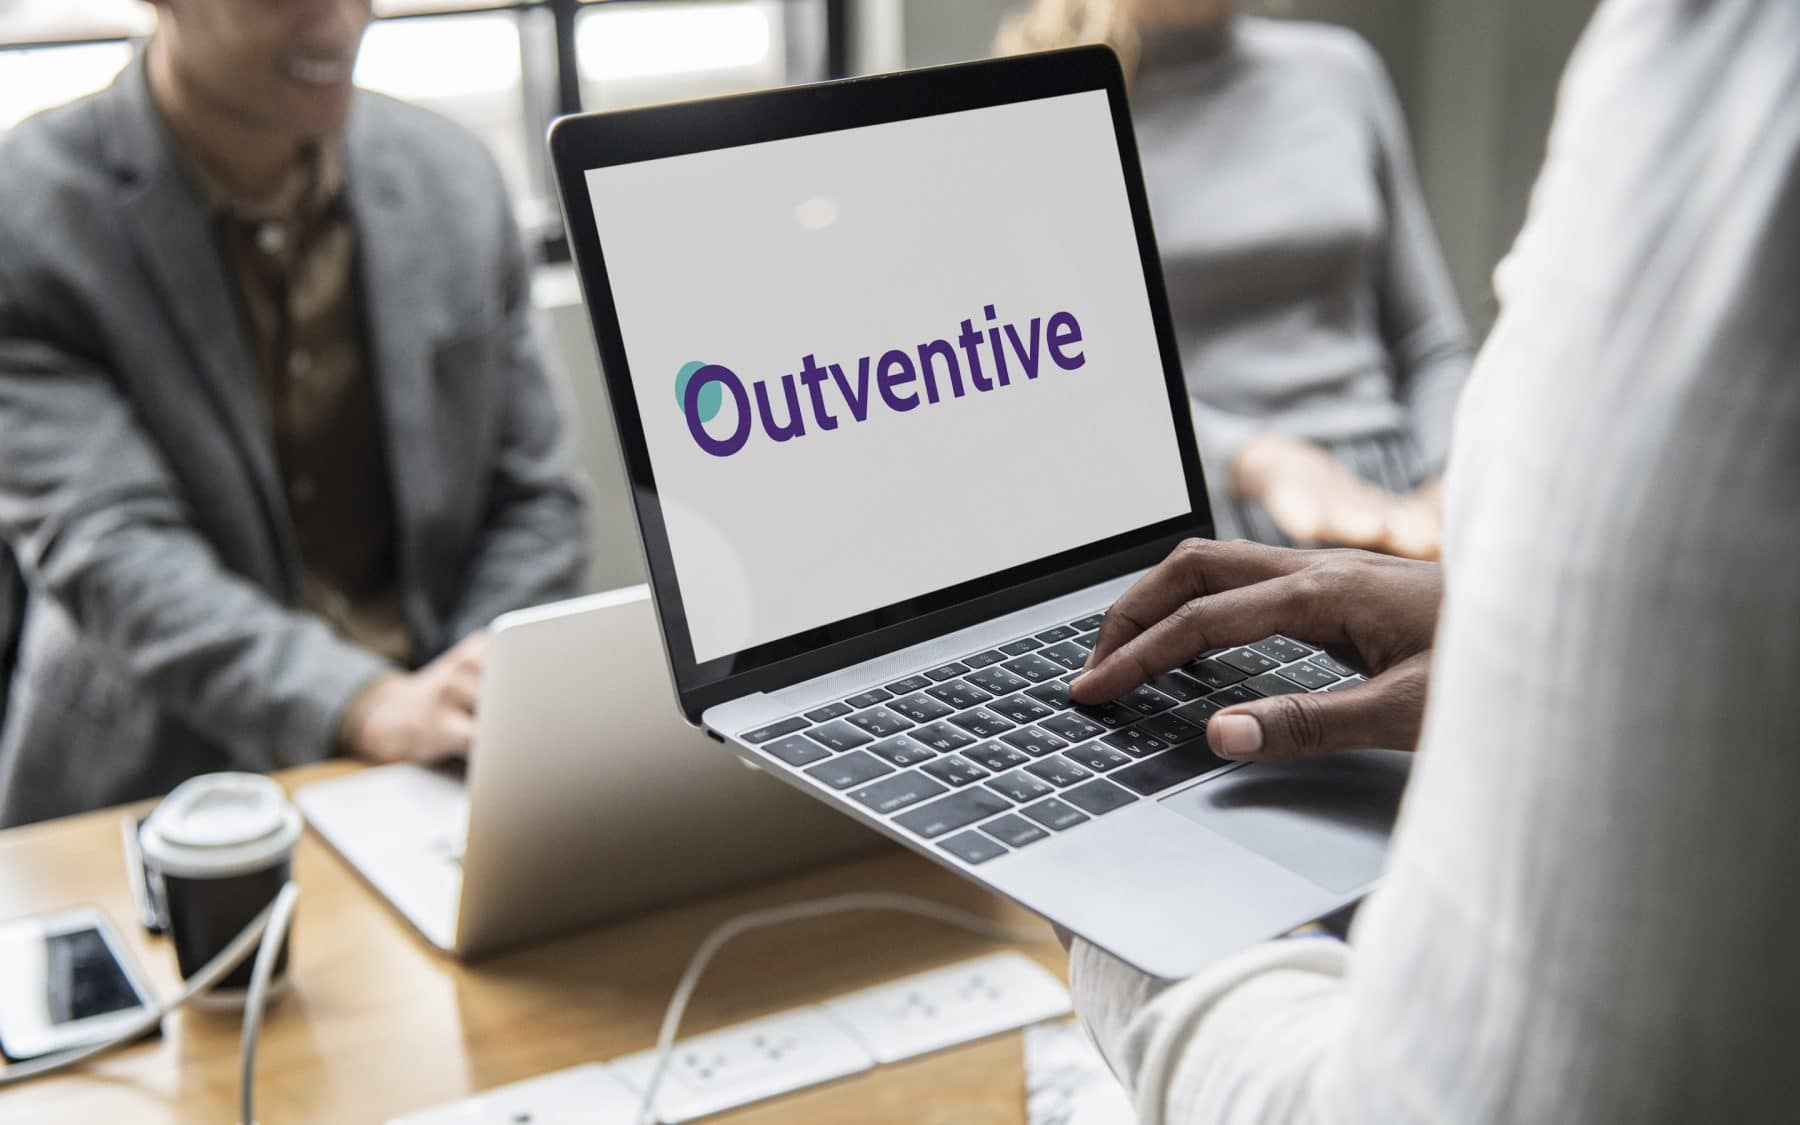 Outventive